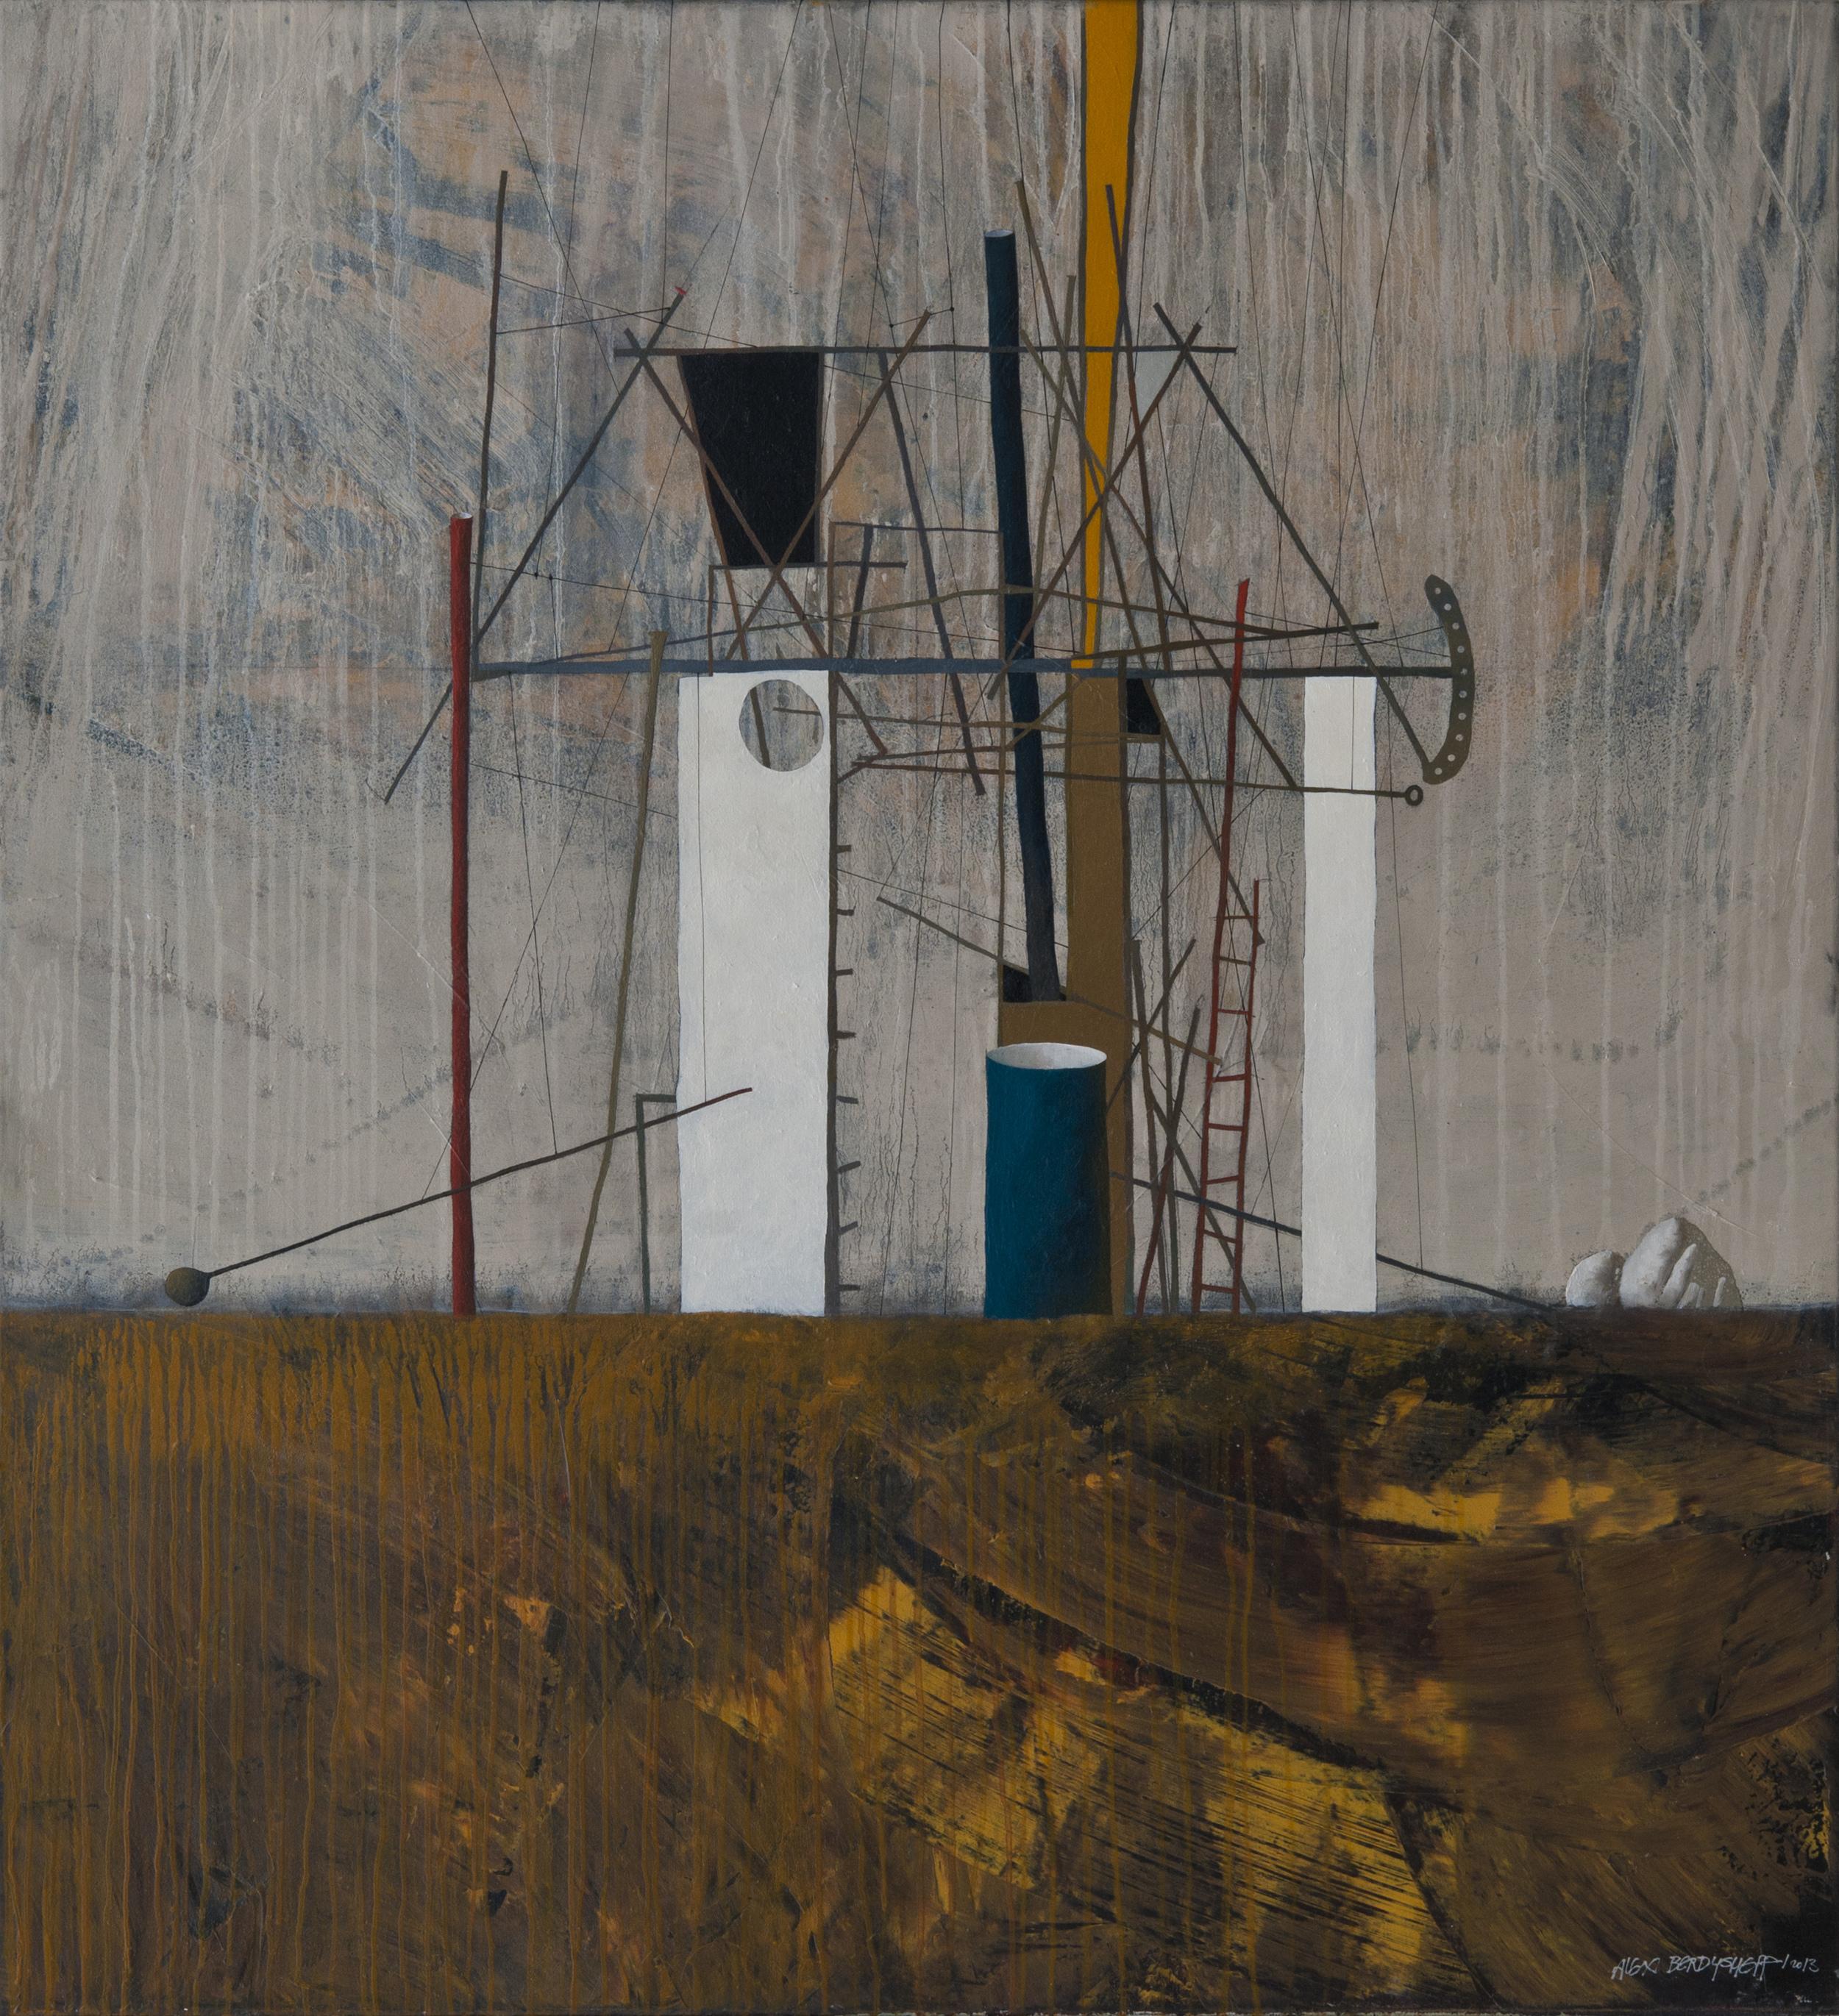 Casa II, oil on canvas, 120x110 cm, 2013